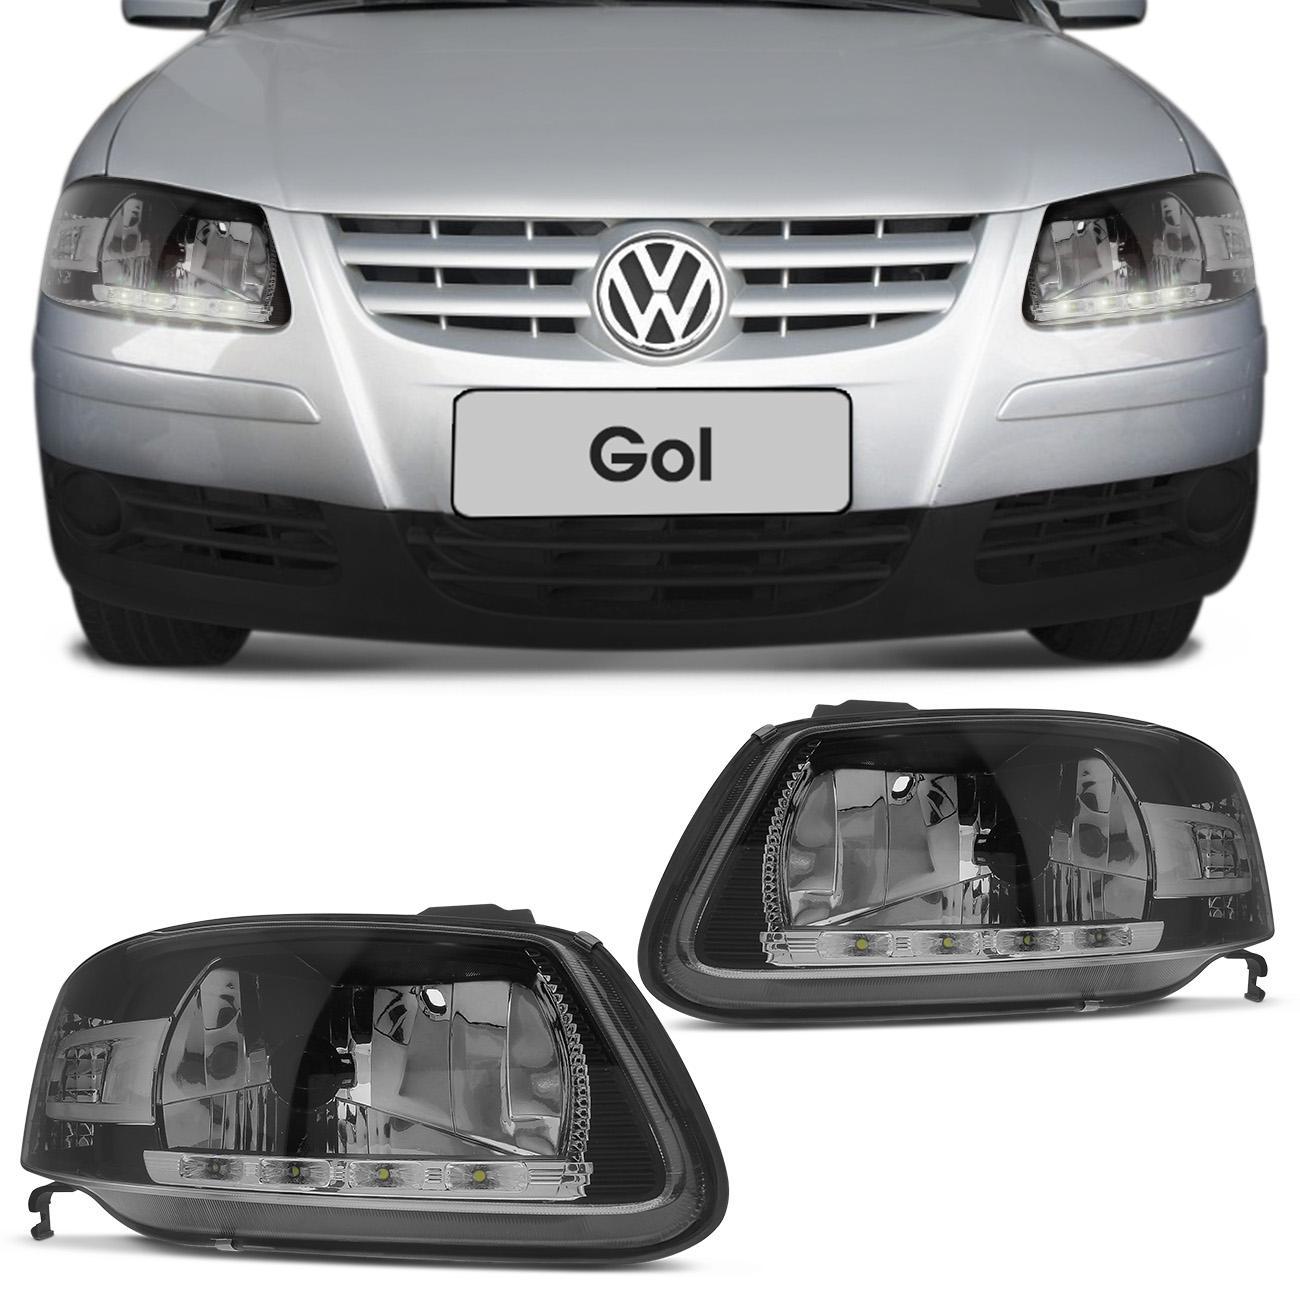 Farol Gol Parati Saveiro G4 06 a 14 Foco Simples Máscara Negra LED Lado Esquerdo Motorista